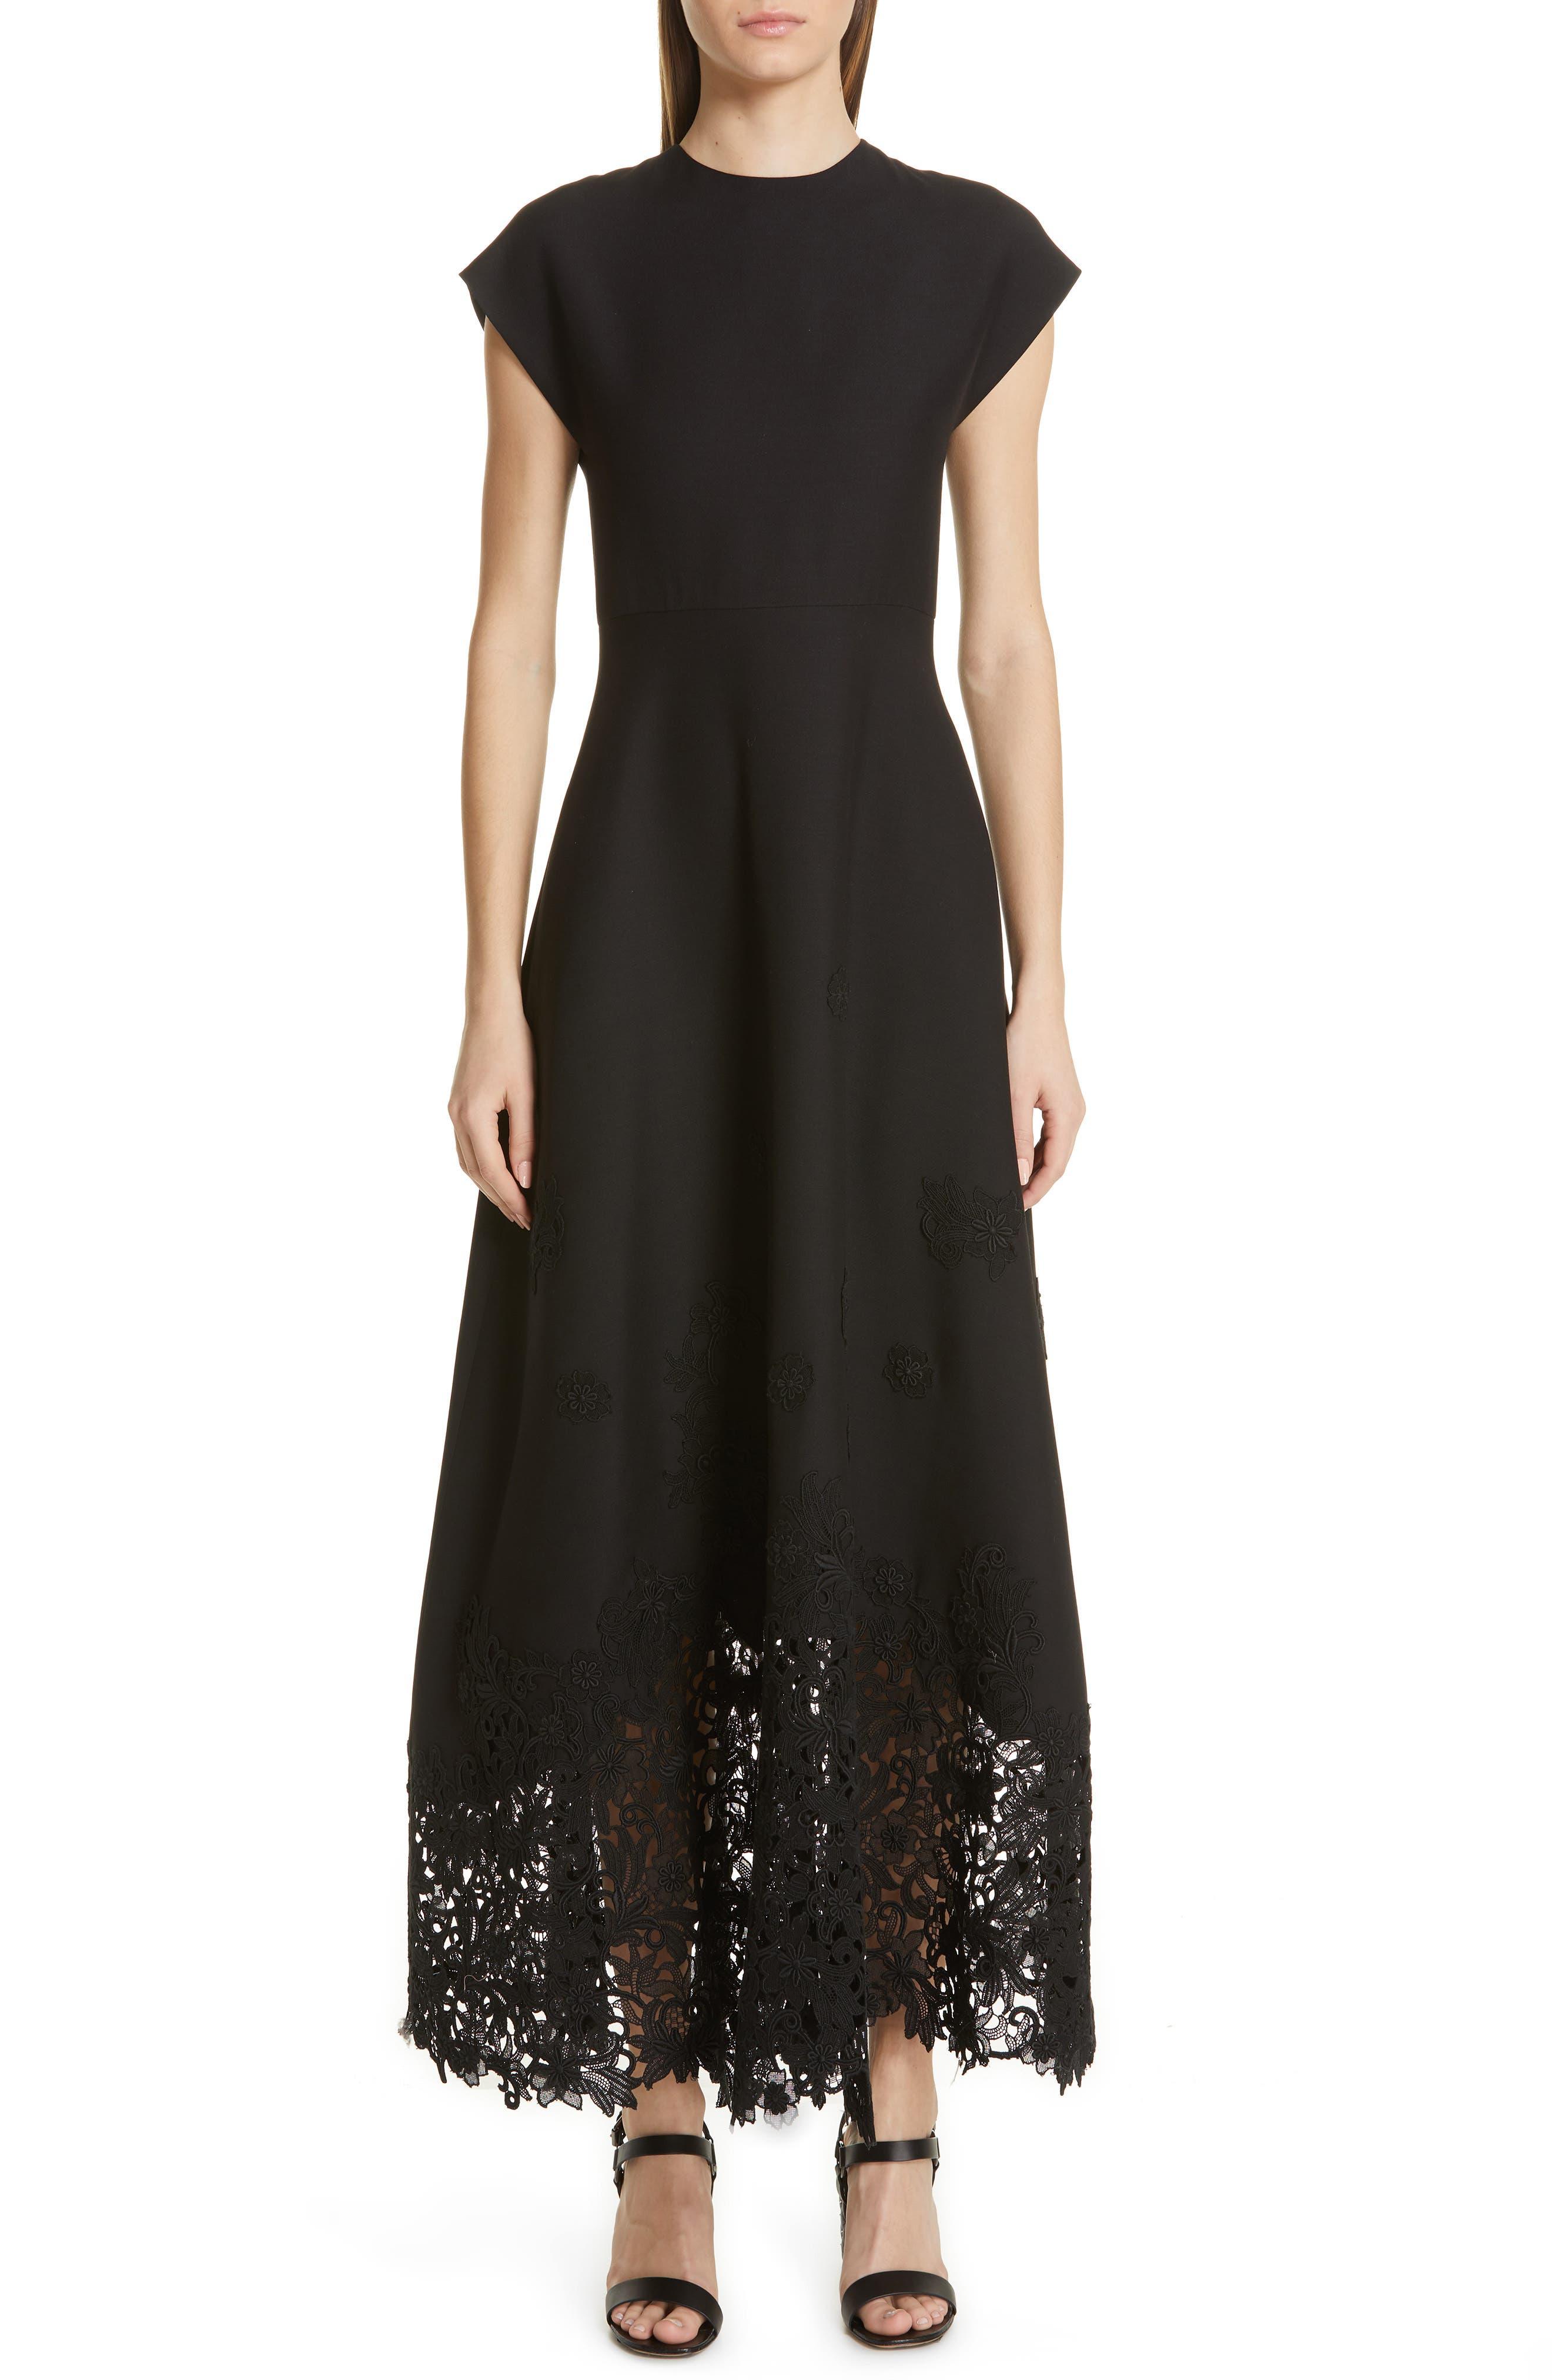 Valentino Laser Cut Hem Crepe Couture Dress, 8 IT - Black